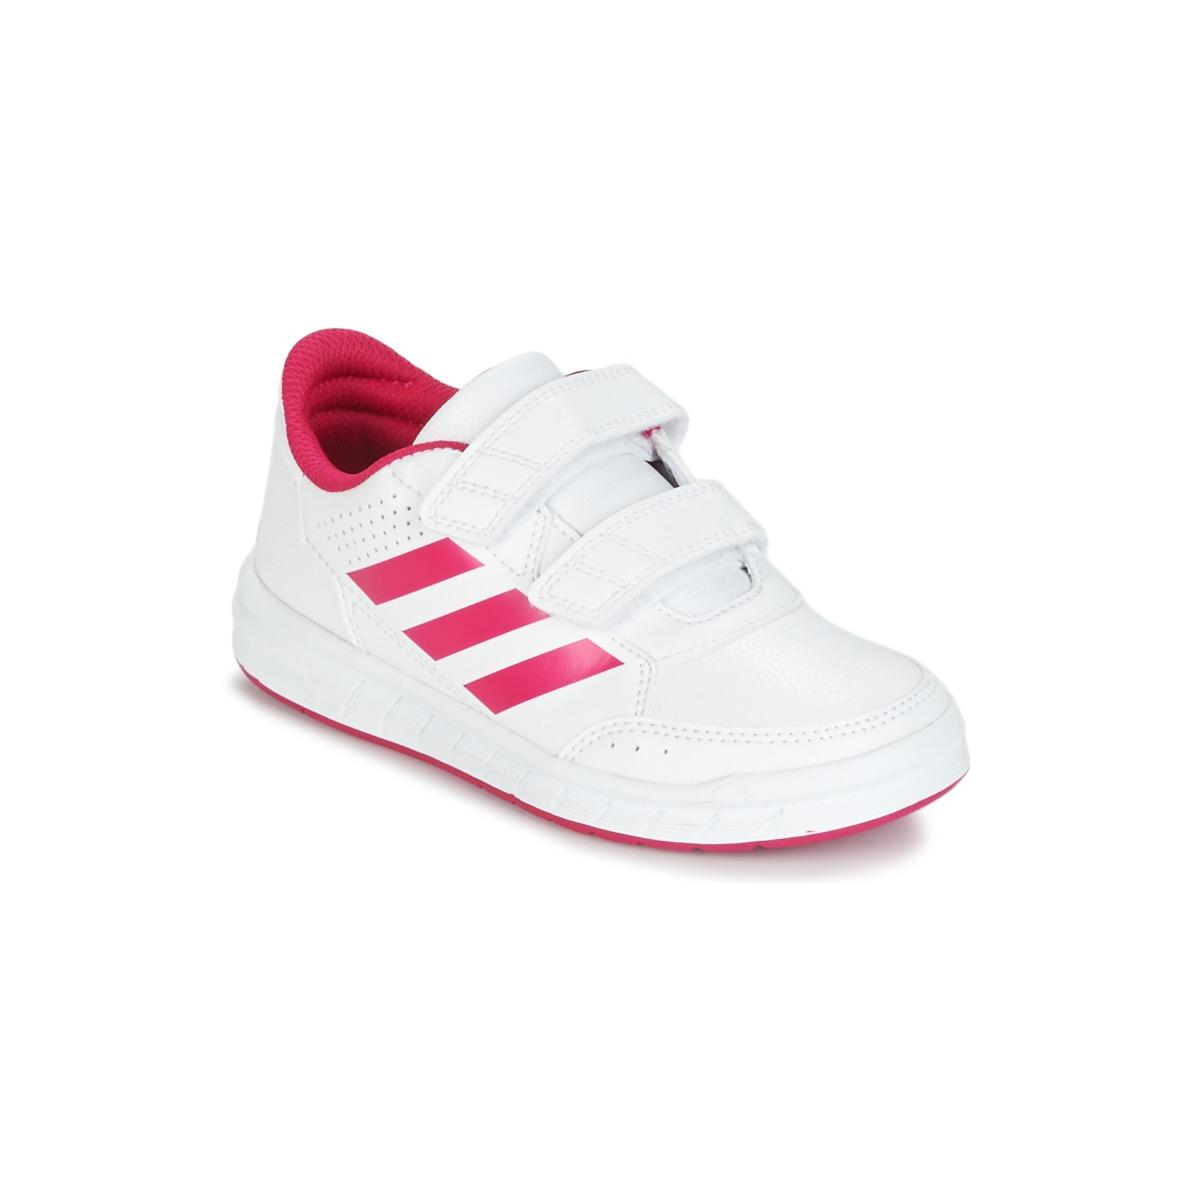 adidas Tenisky Dětské ALTASPORT CF K adidas - Glami.cz 2af226af79